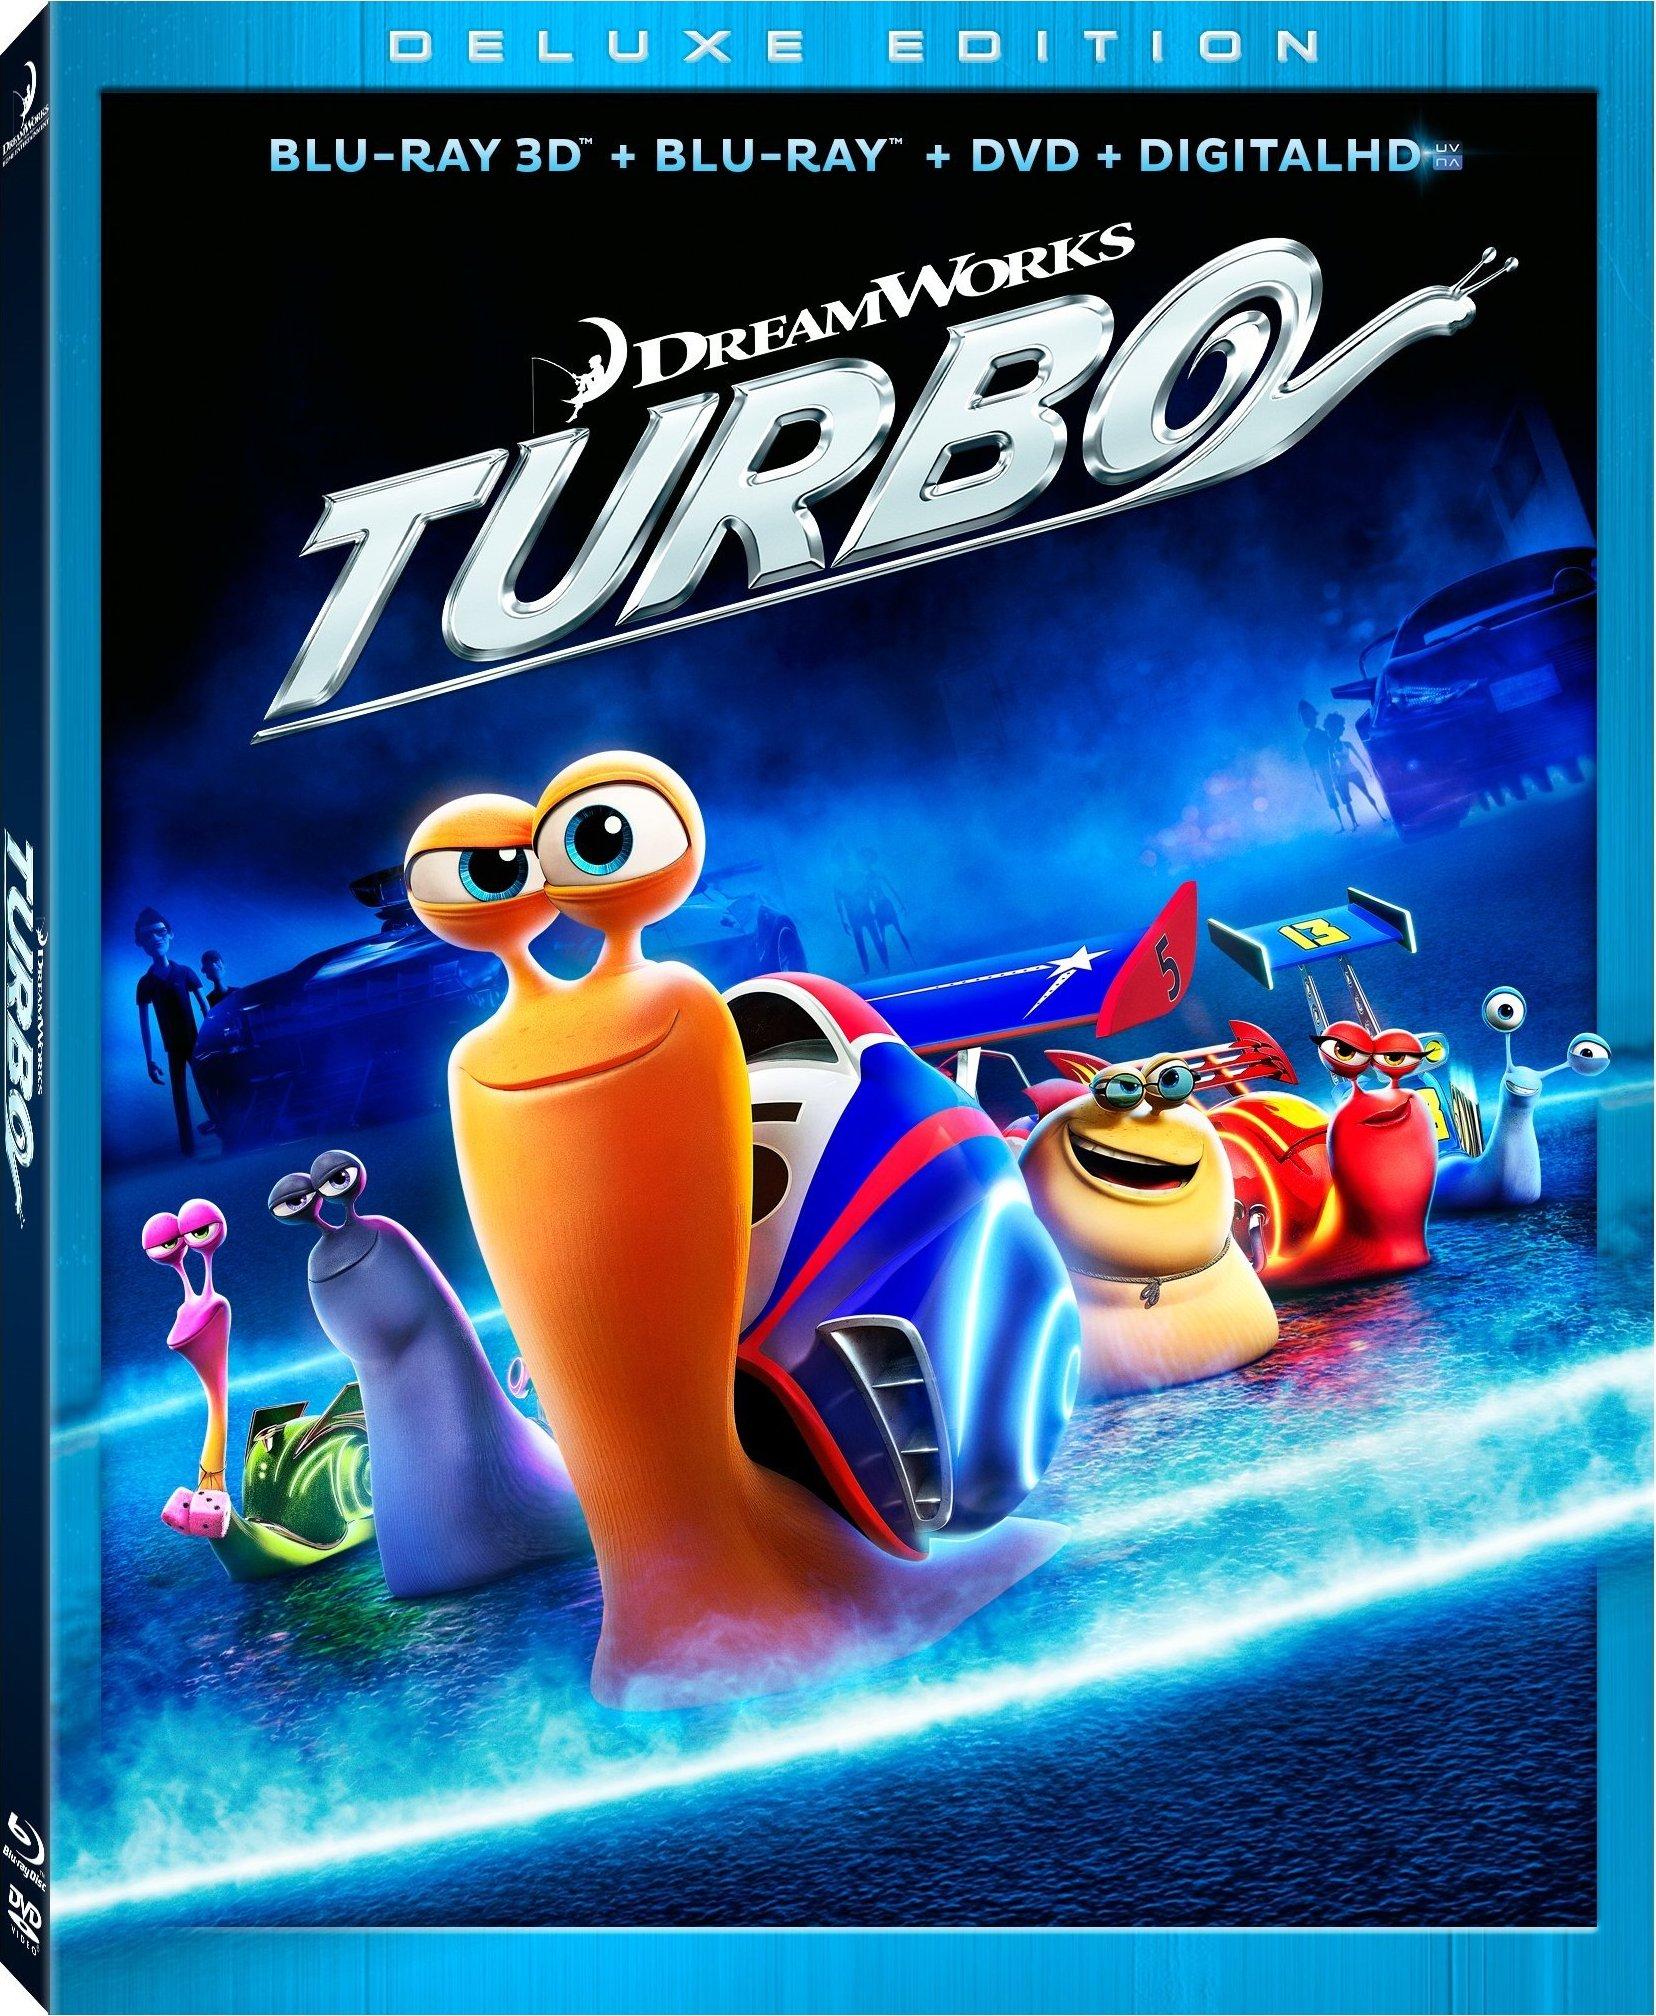 Turbo [1080p] MULTI 2013 BluRay x264